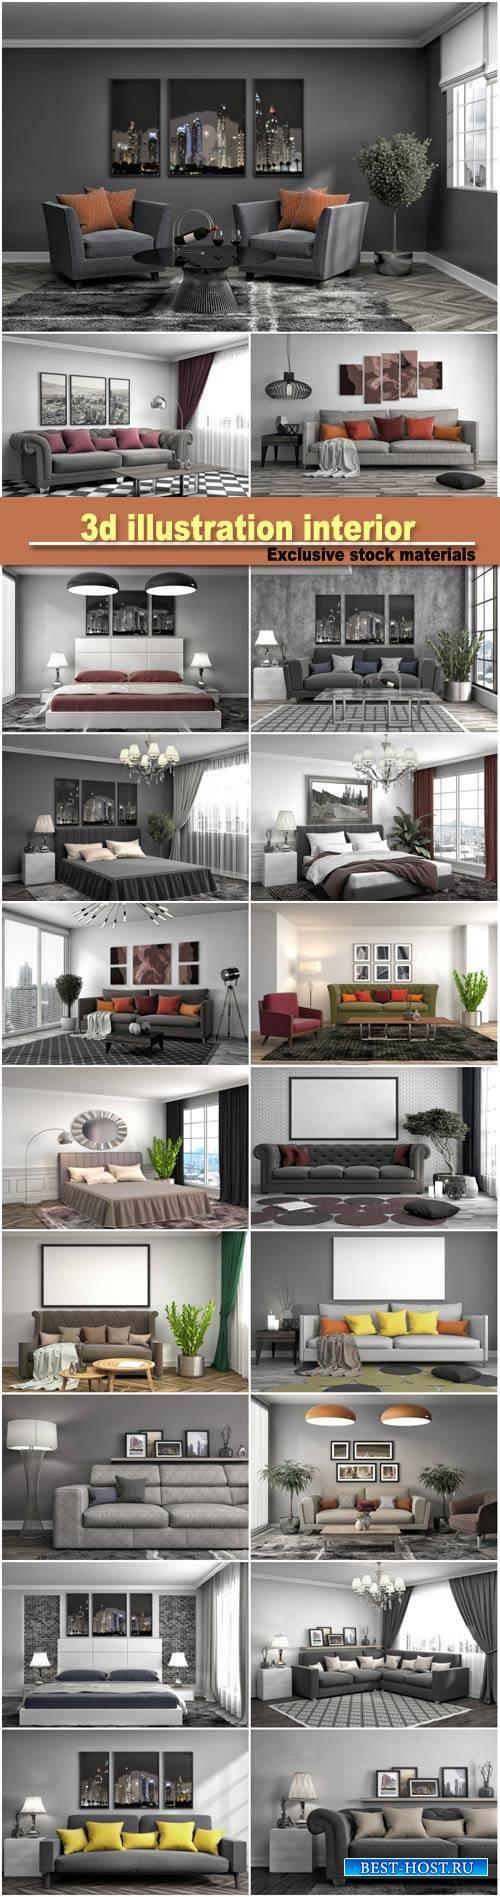 3d illustration bedroom interior, interior with sofa